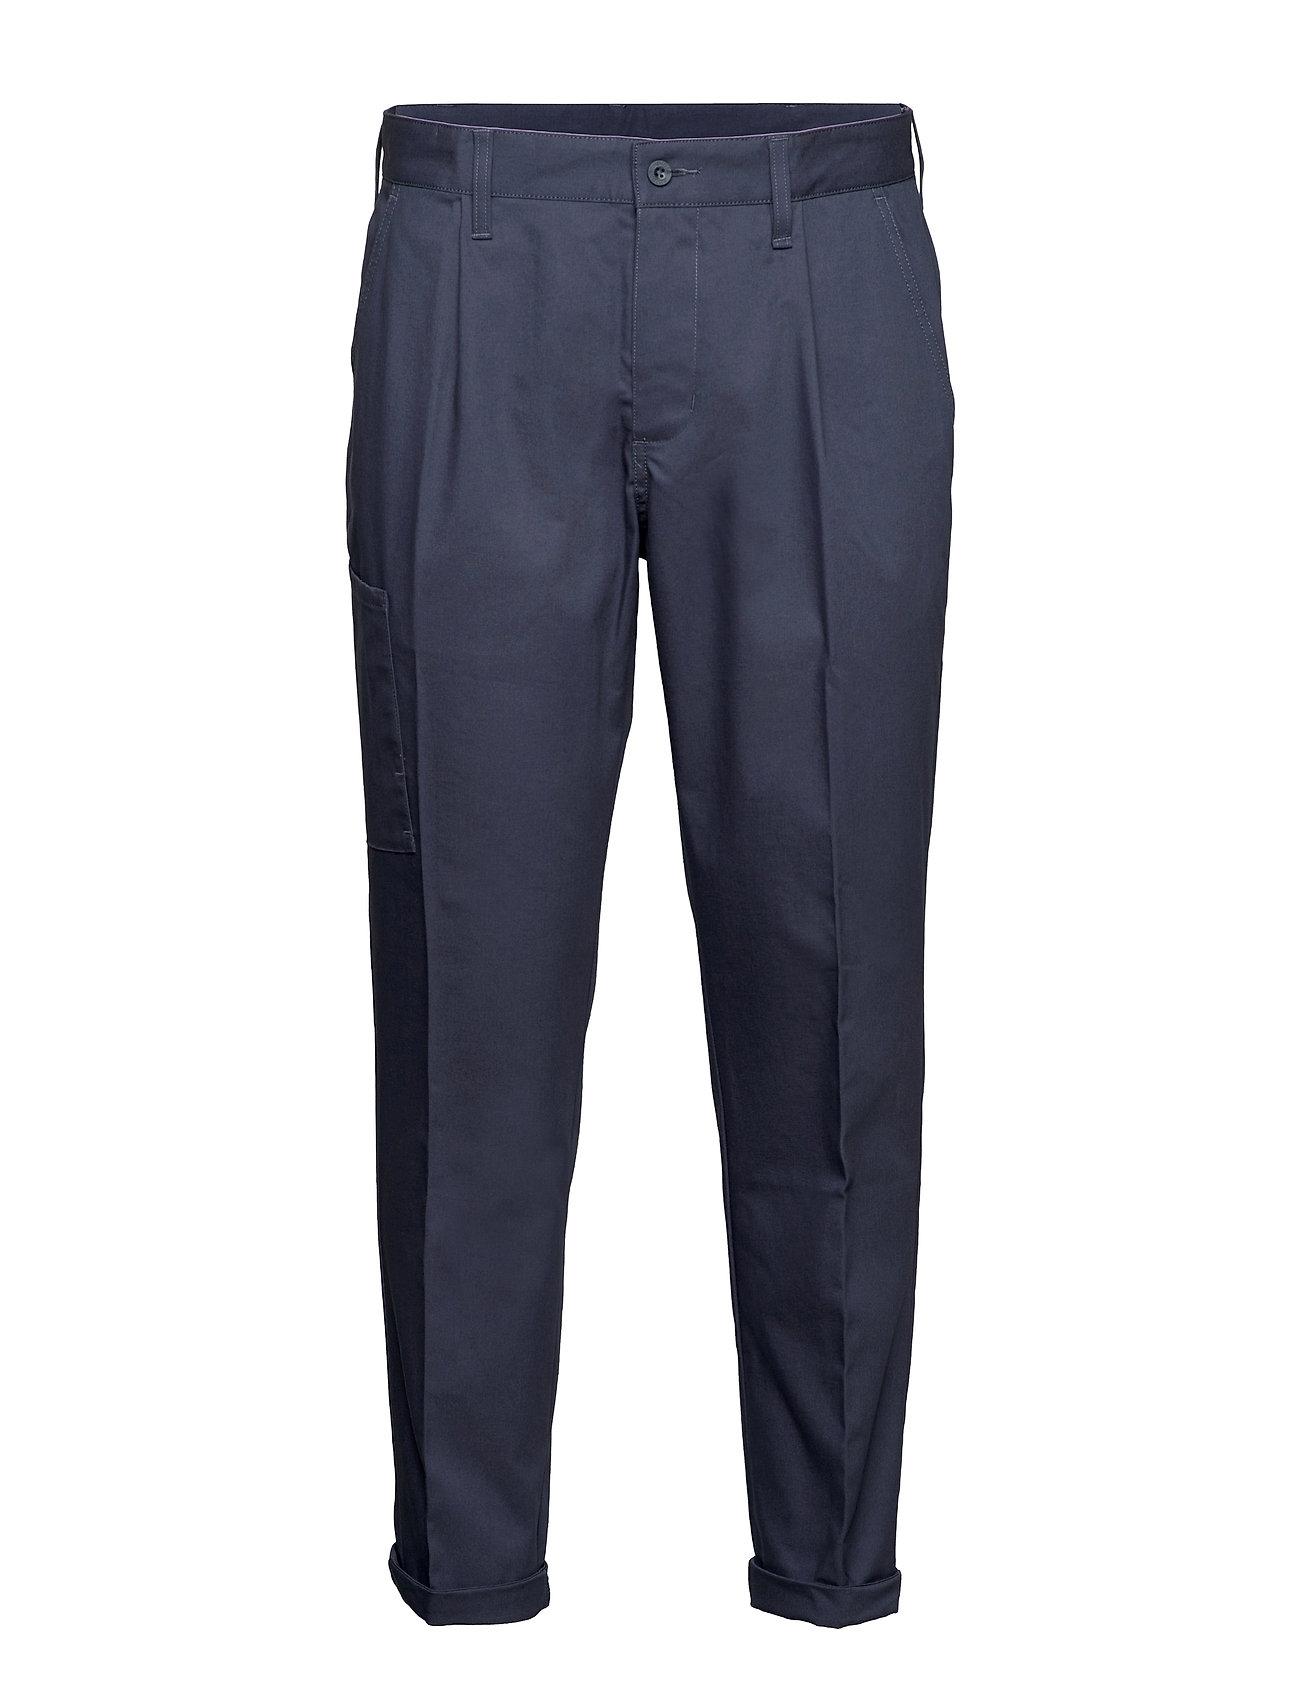 Adcrs Chno Pnt Sport Pants Blå Adidas Golf